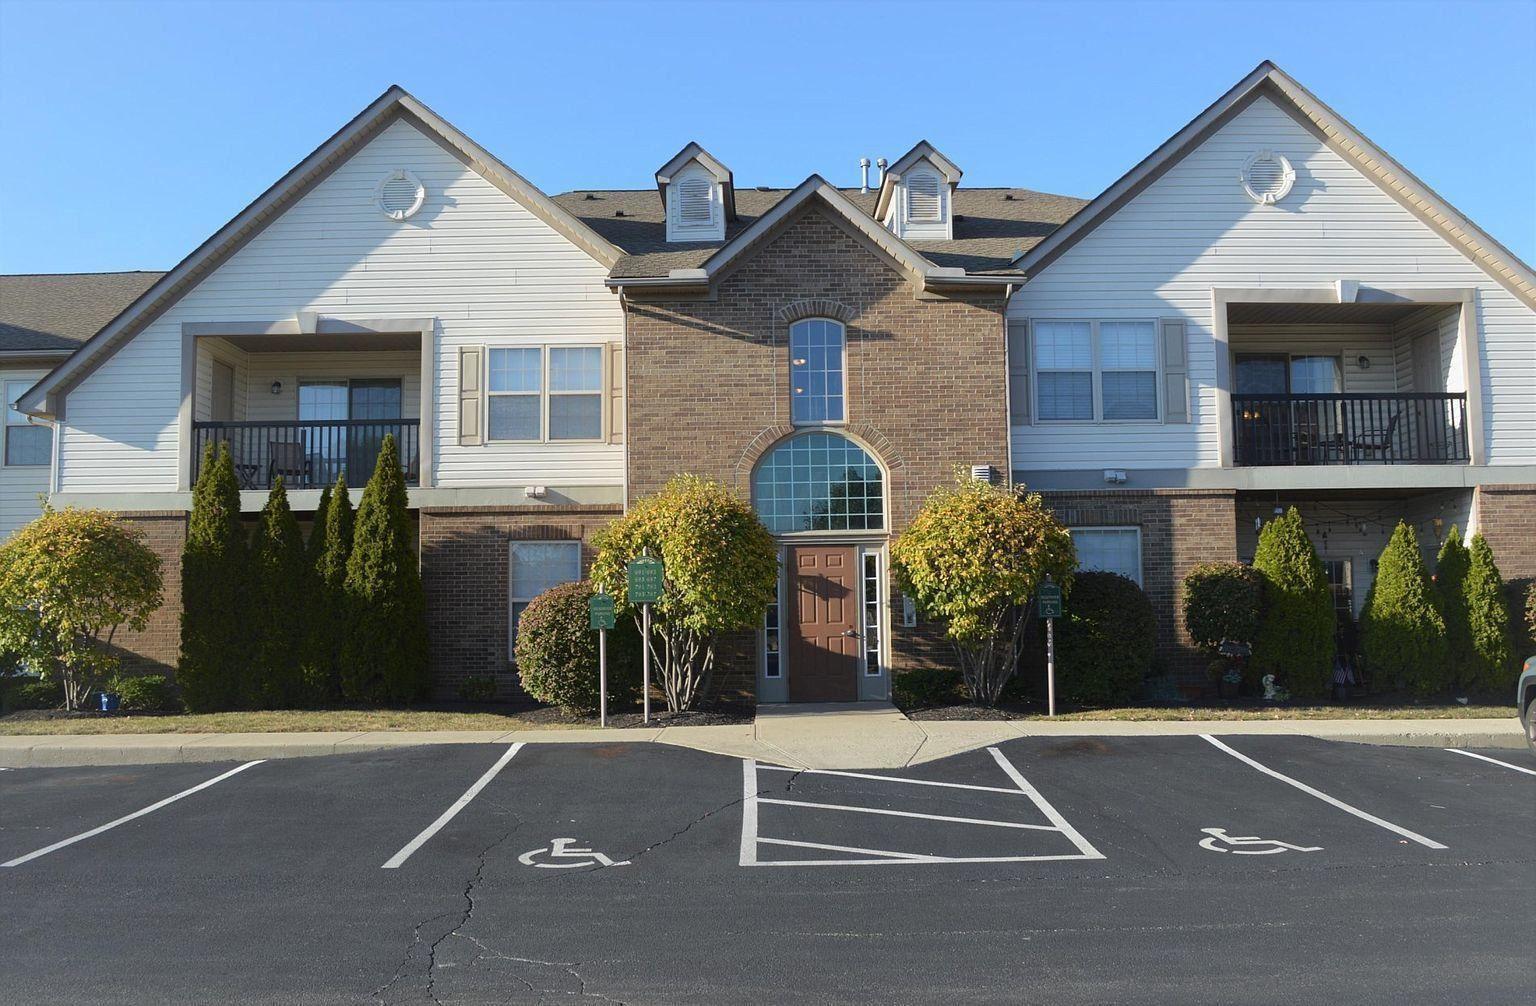 705 Hidden Springs Drive, Lewis Center, OH 43035 - MLS#: 221006048